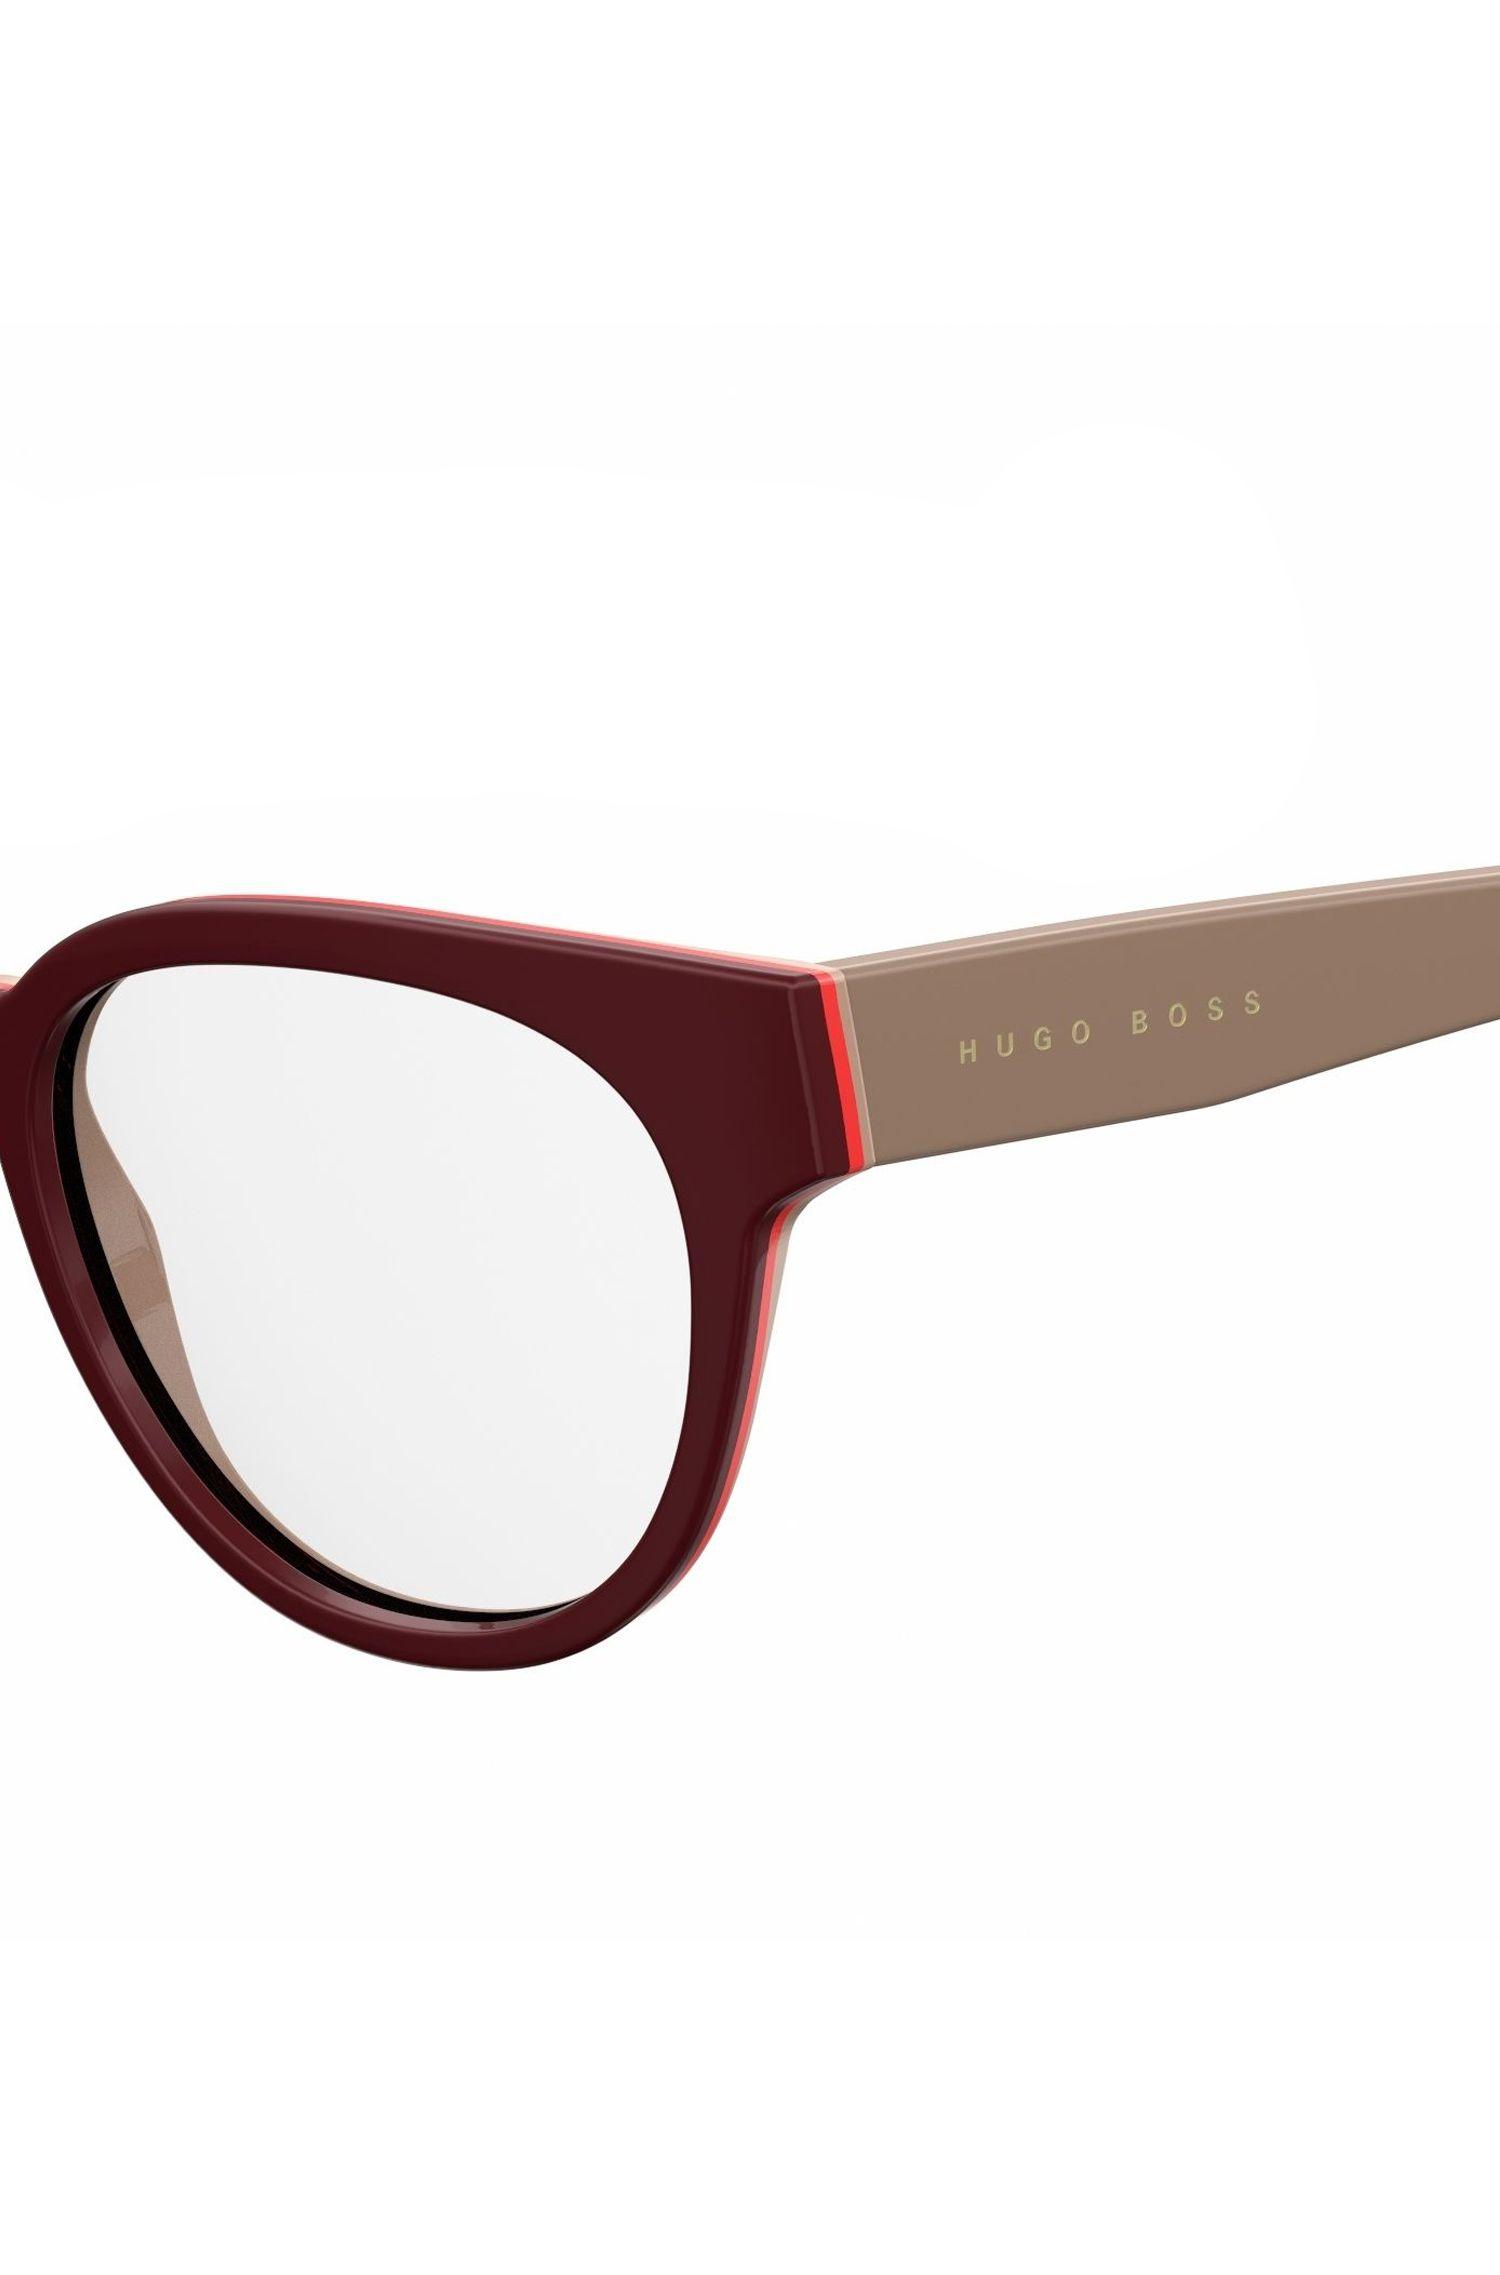 Burgundy Acetate Round Optical Frames | BOSS 0889 0U2